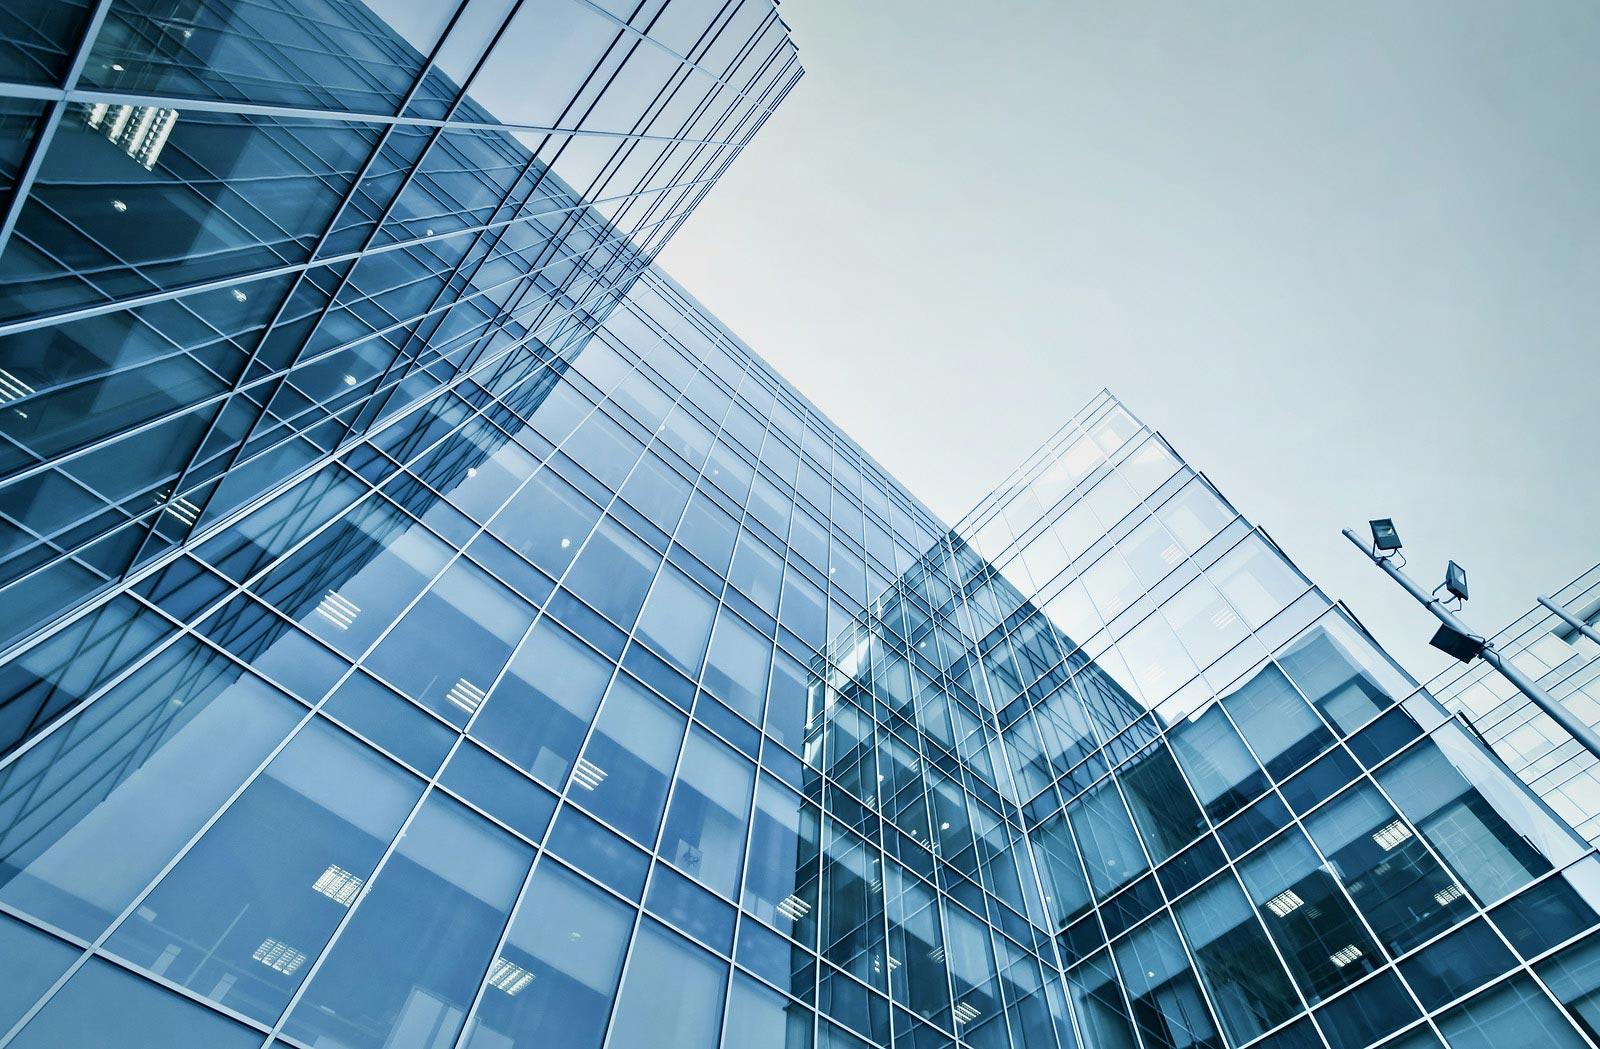 Website Development Company In Mumbai Pgi Real Estate Property Group International